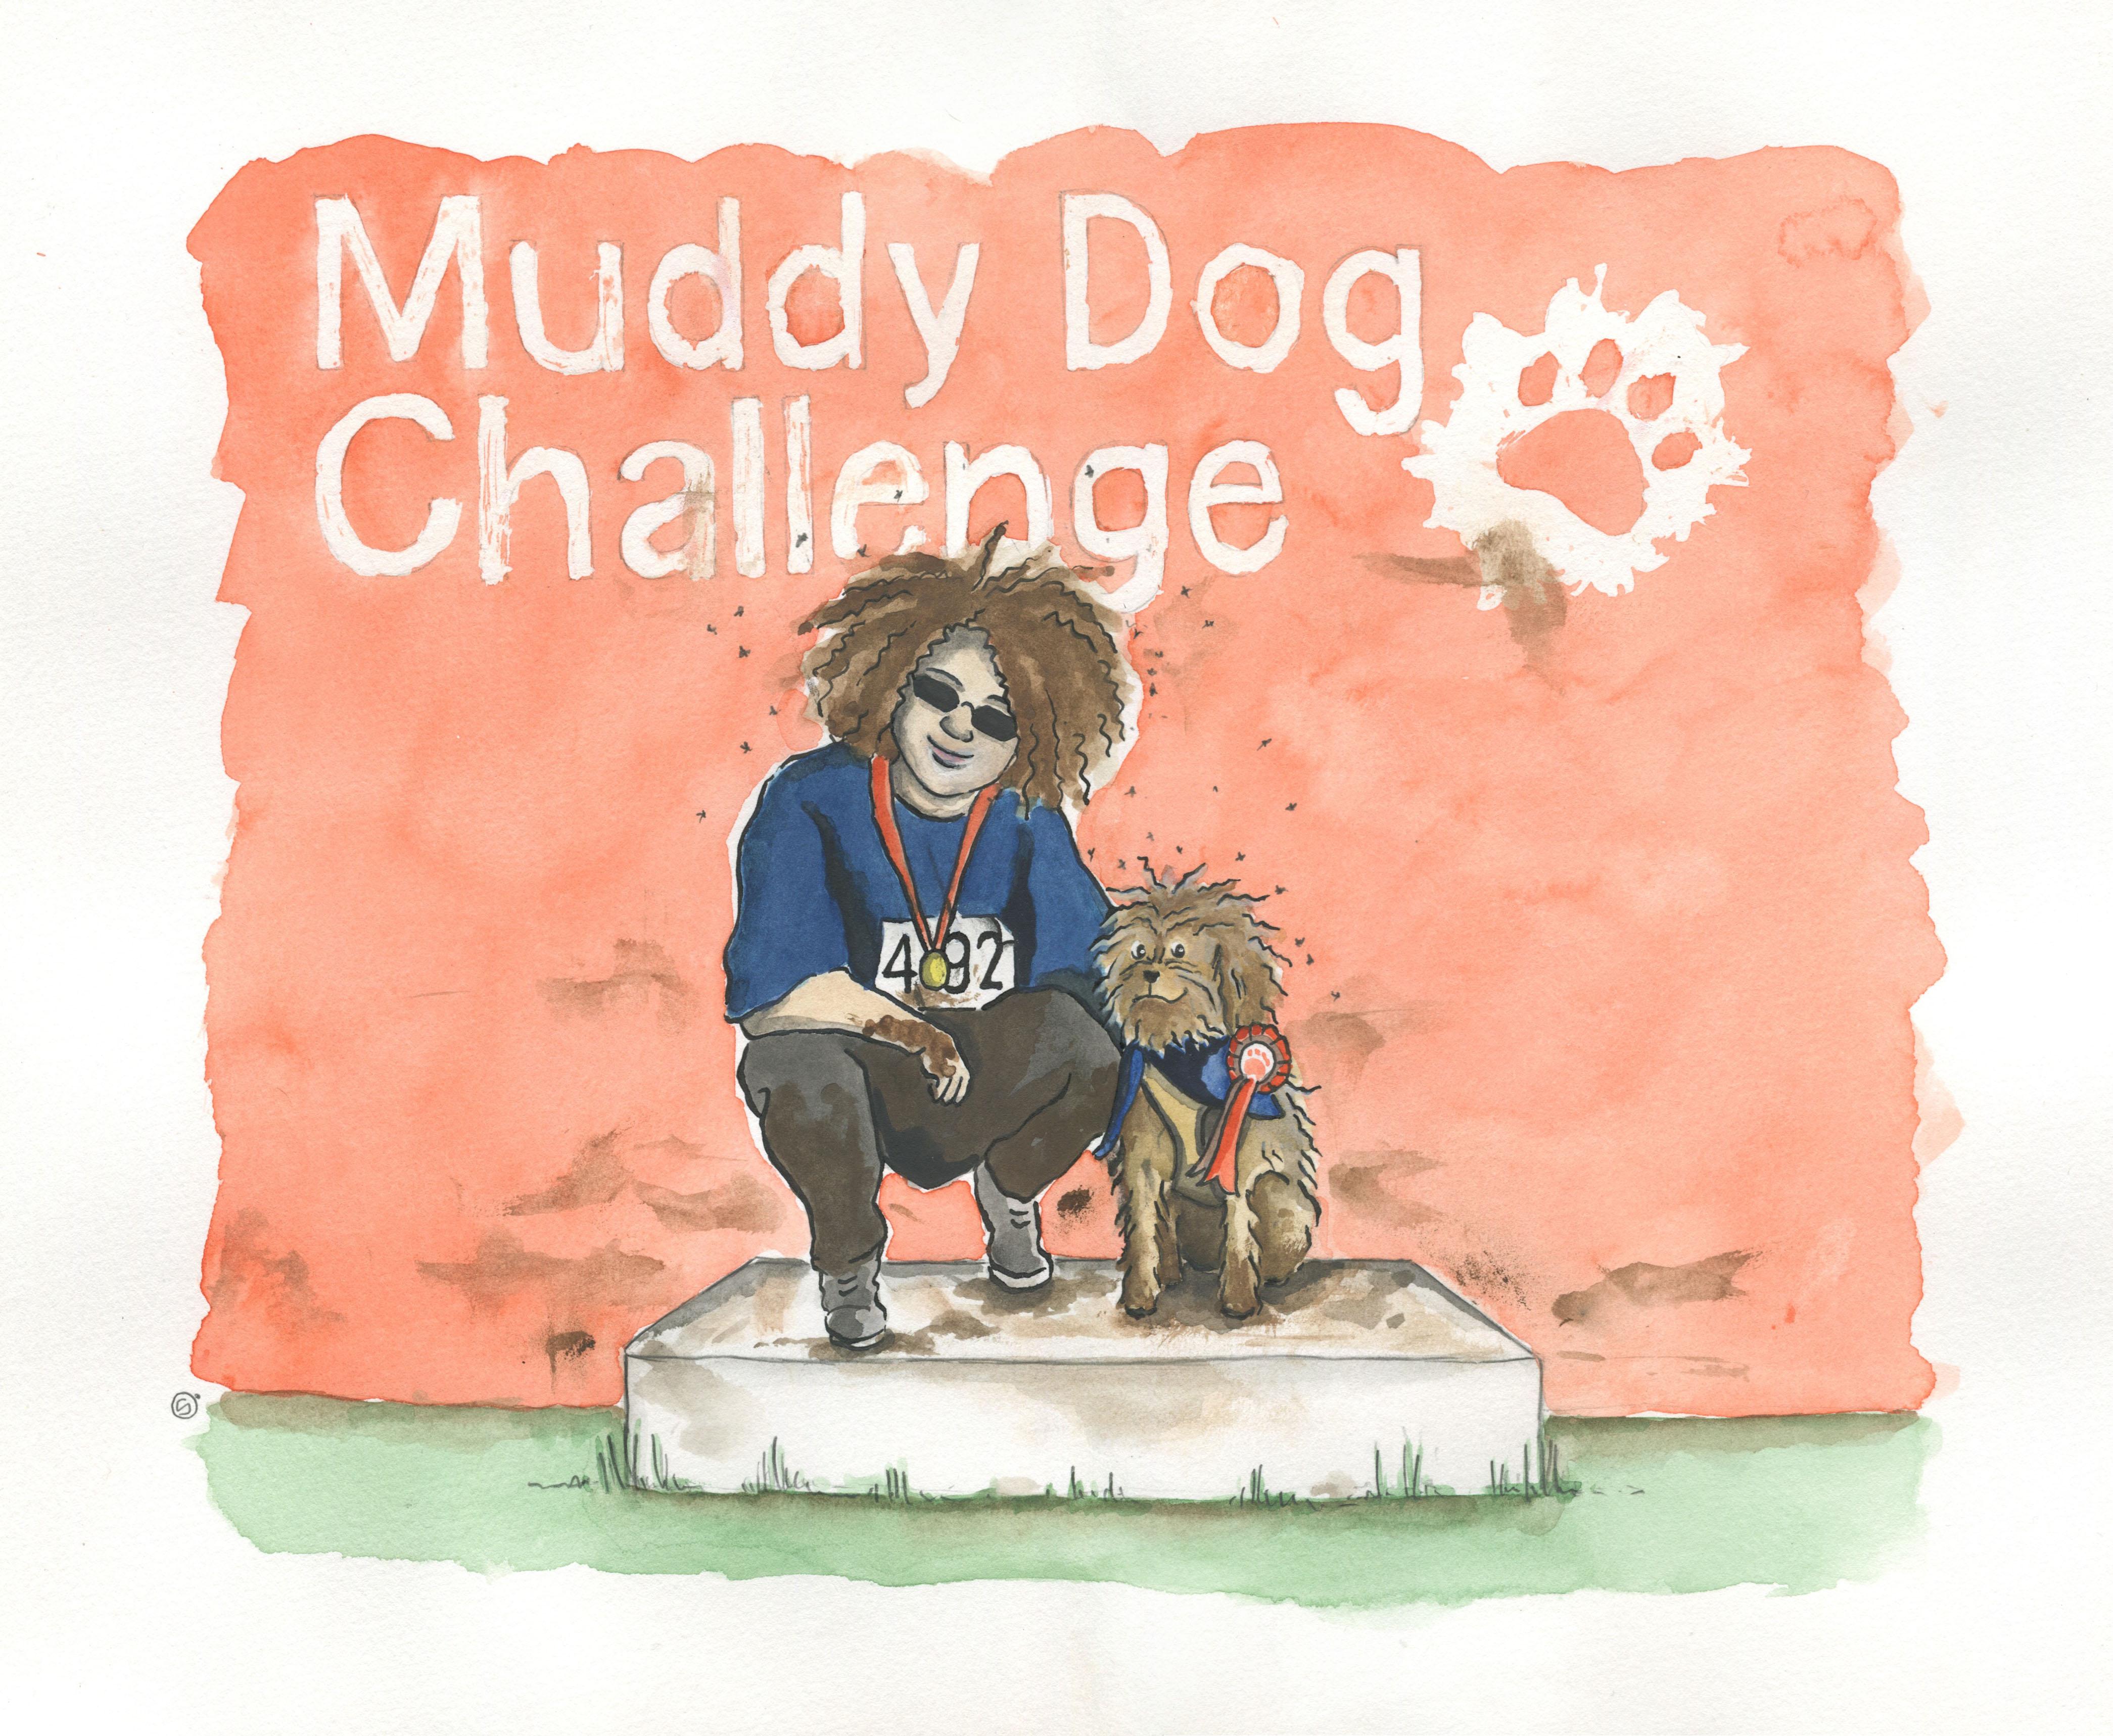 Muddy Dog Challenge